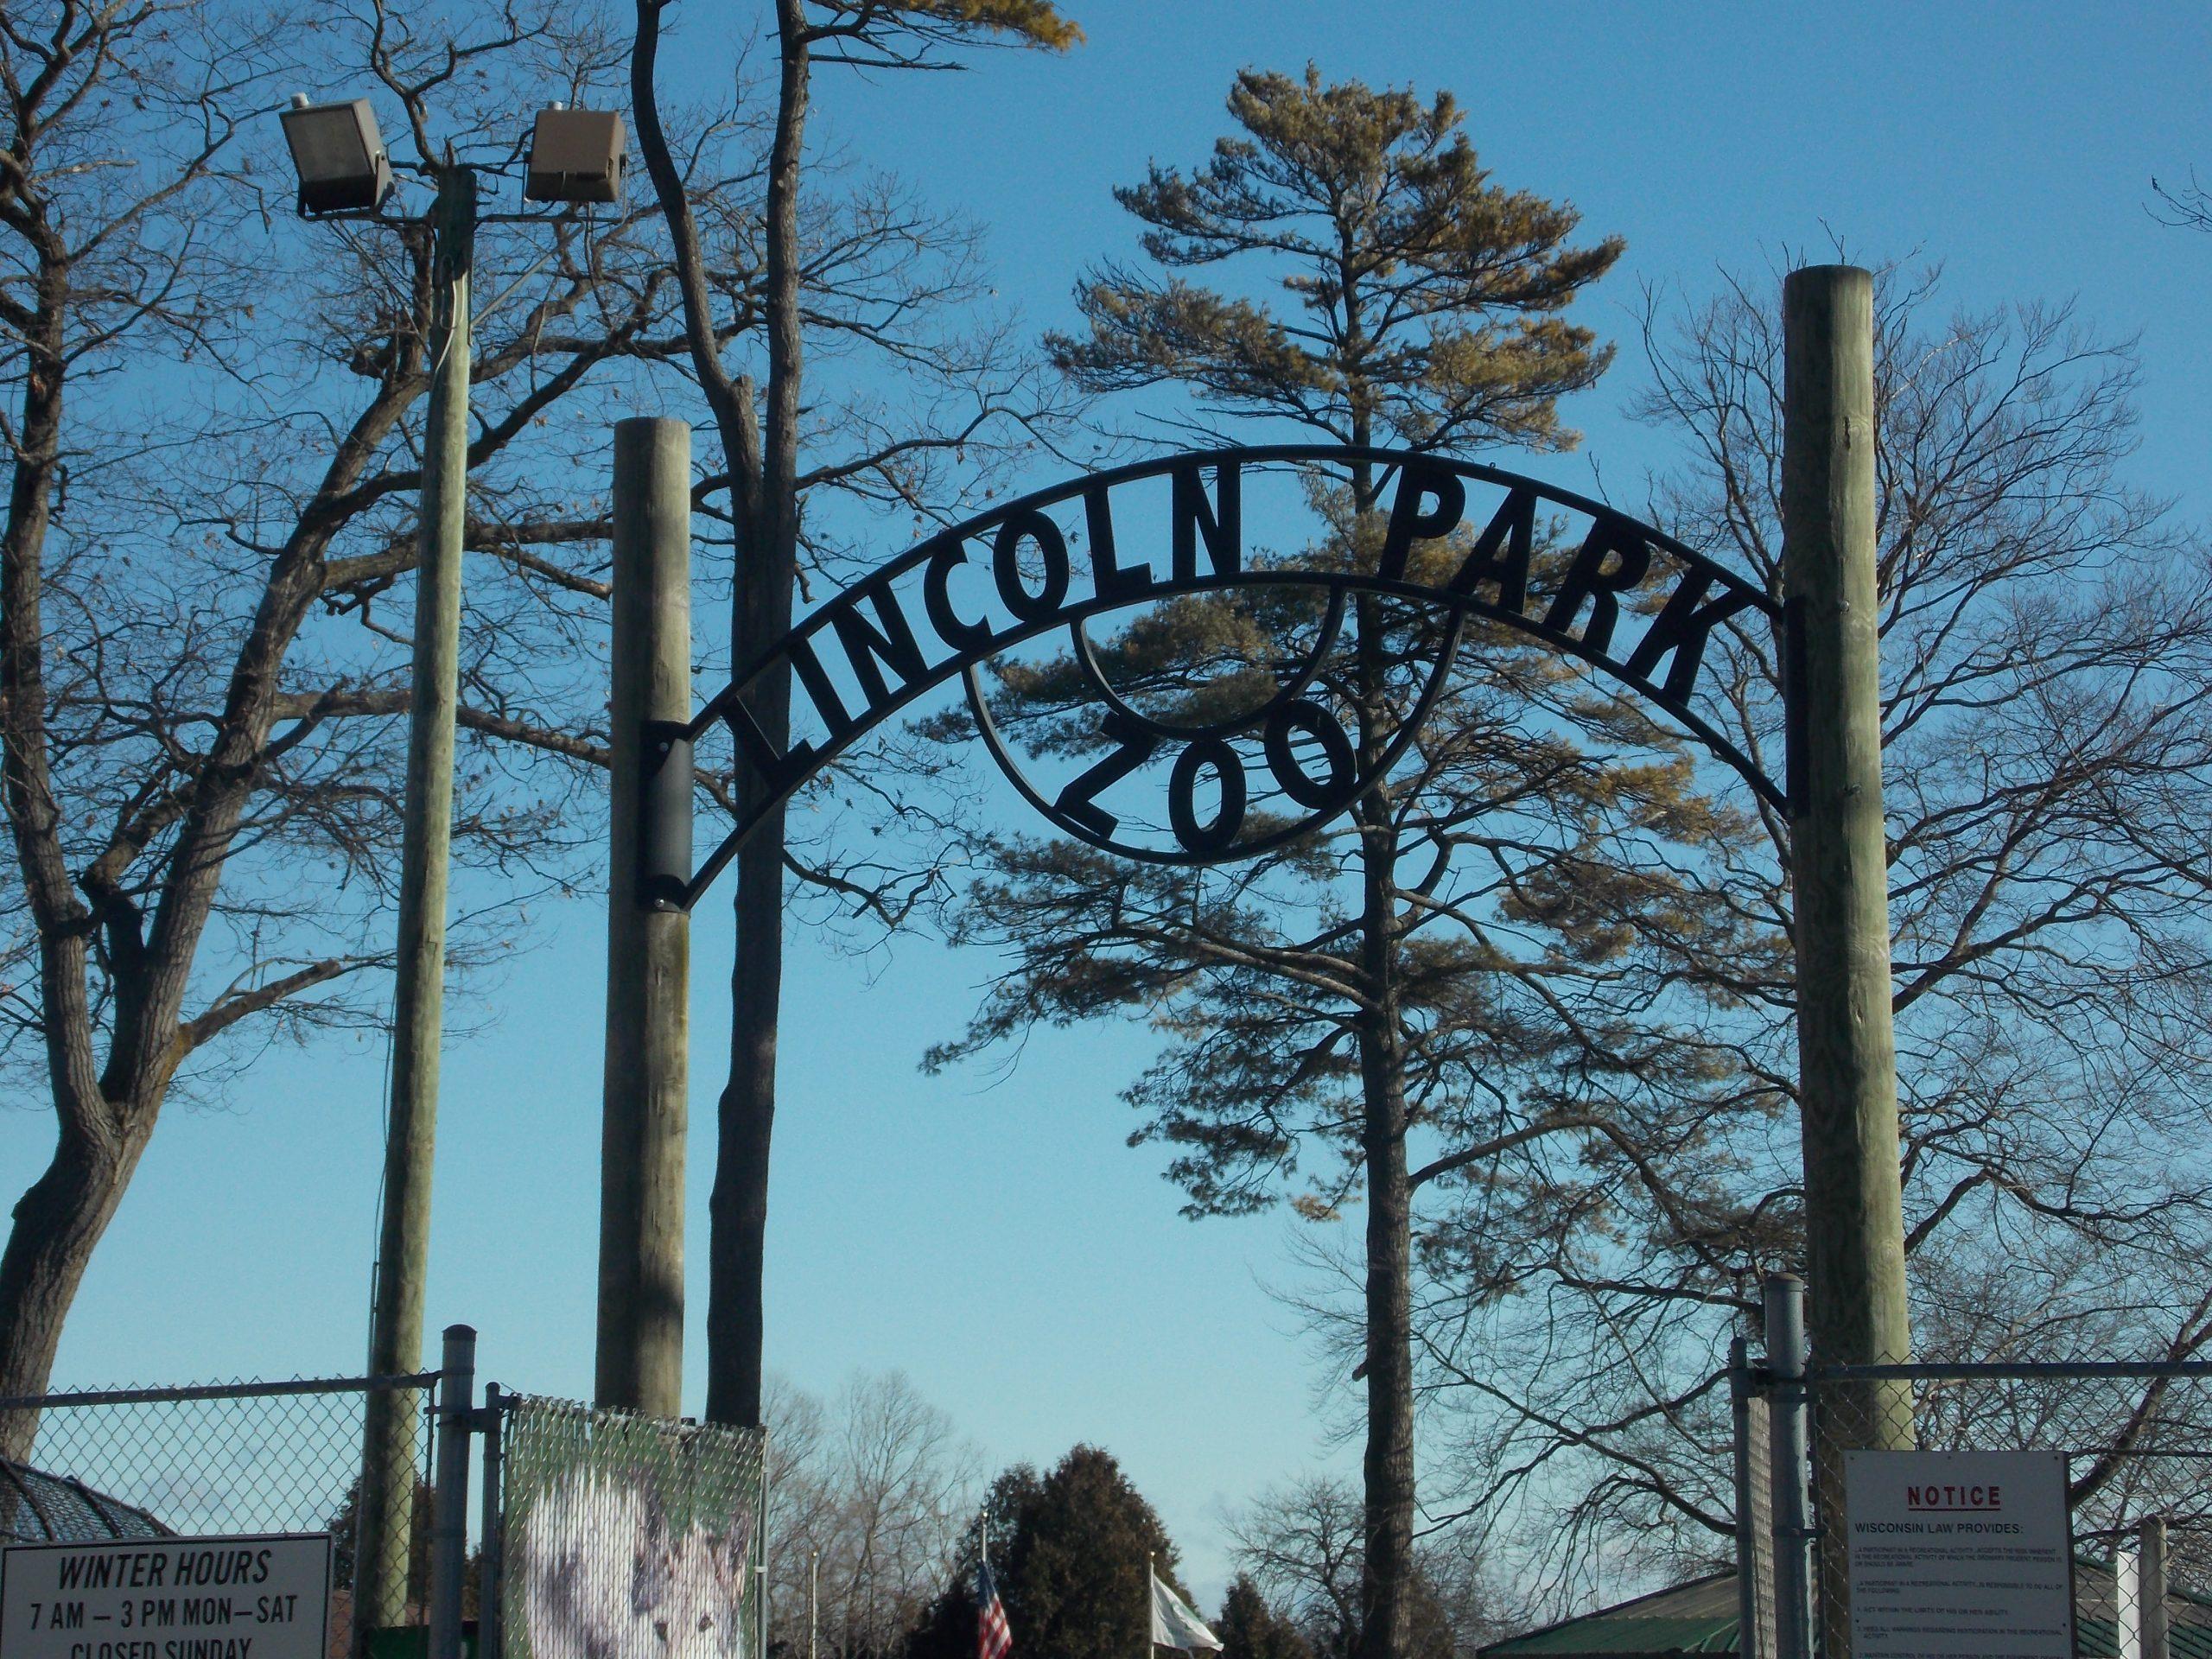 Lincoln Park Zoo Walkway Construction Underway